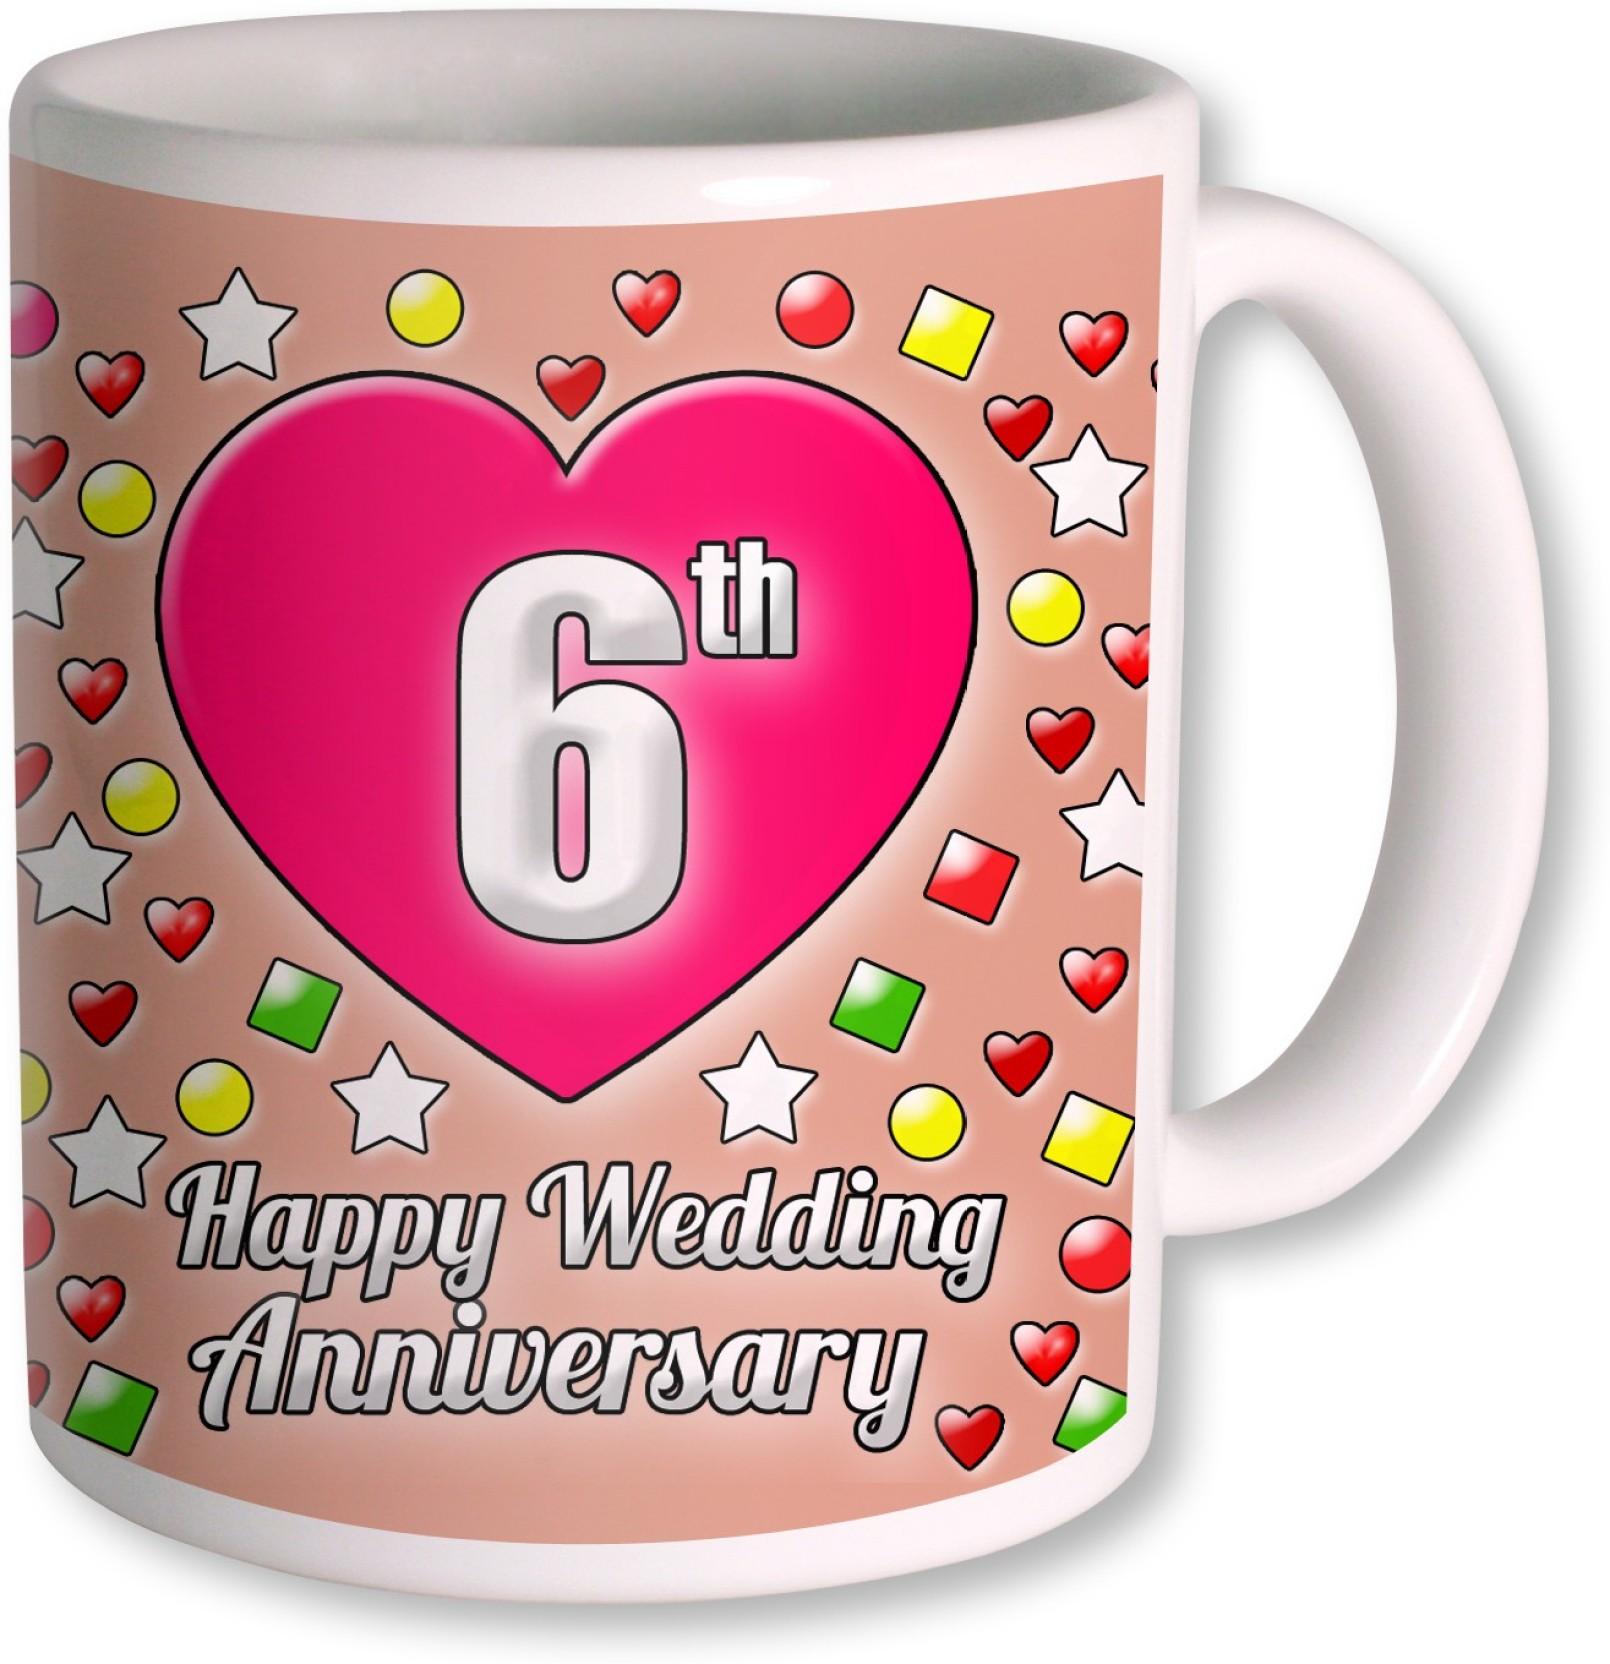 PhotogiftsIndia Gifts For 6th Wedding Anniversary Coffee Ceramic Mug ...